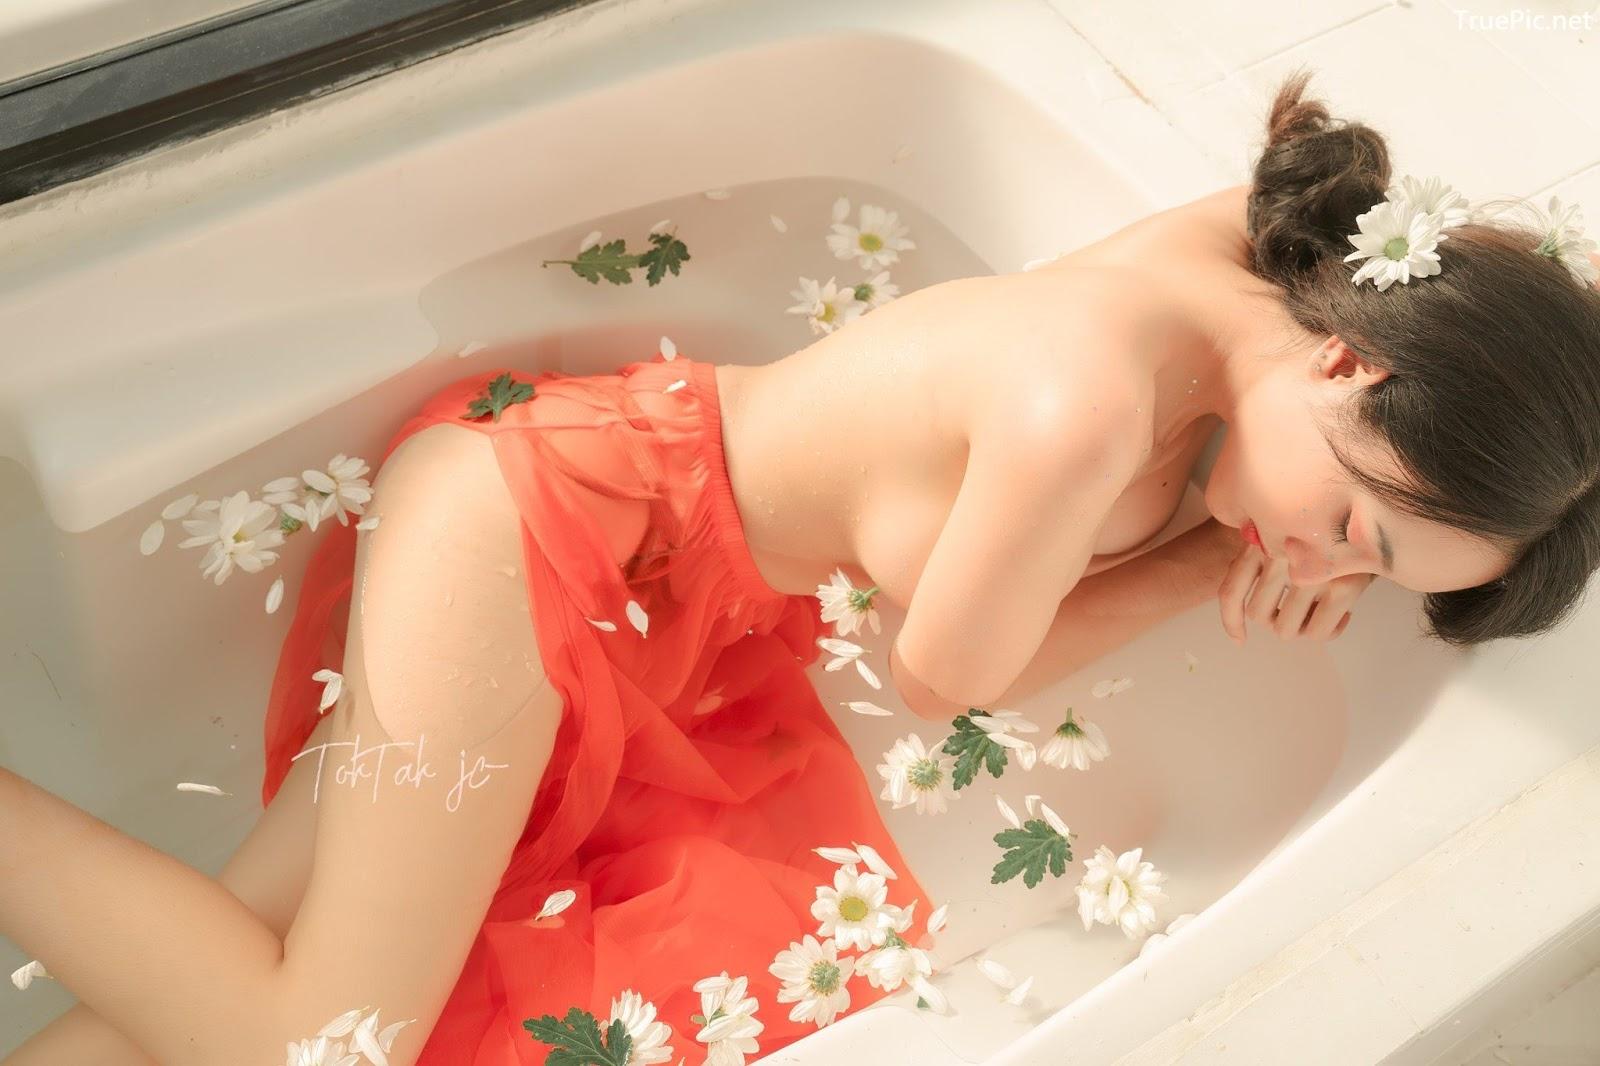 Image-Thailand-Beautiful-Model-Piyatida-Rotjutharak-The-Muse-Concept-TruePic.net- Picture-10